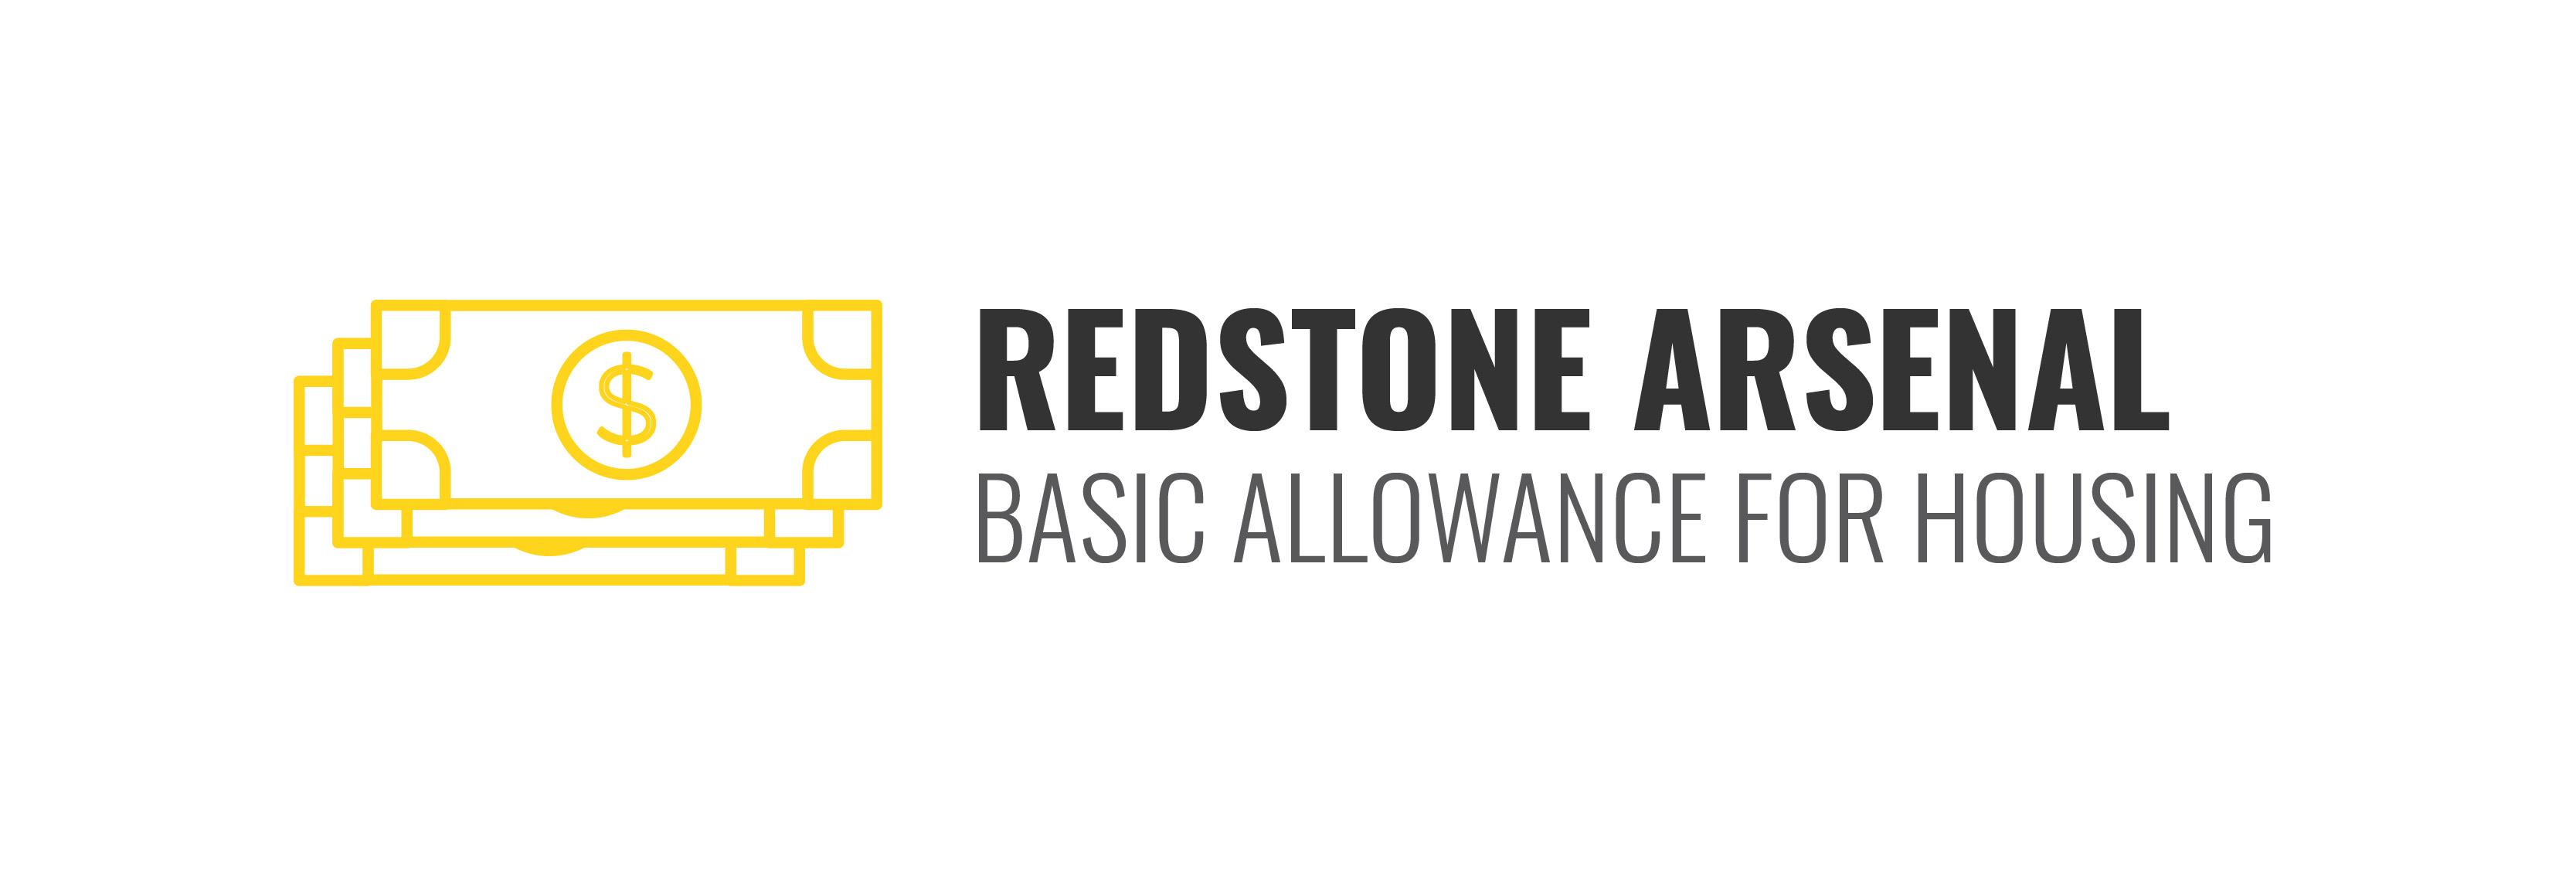 Redstone Arsenal BAH